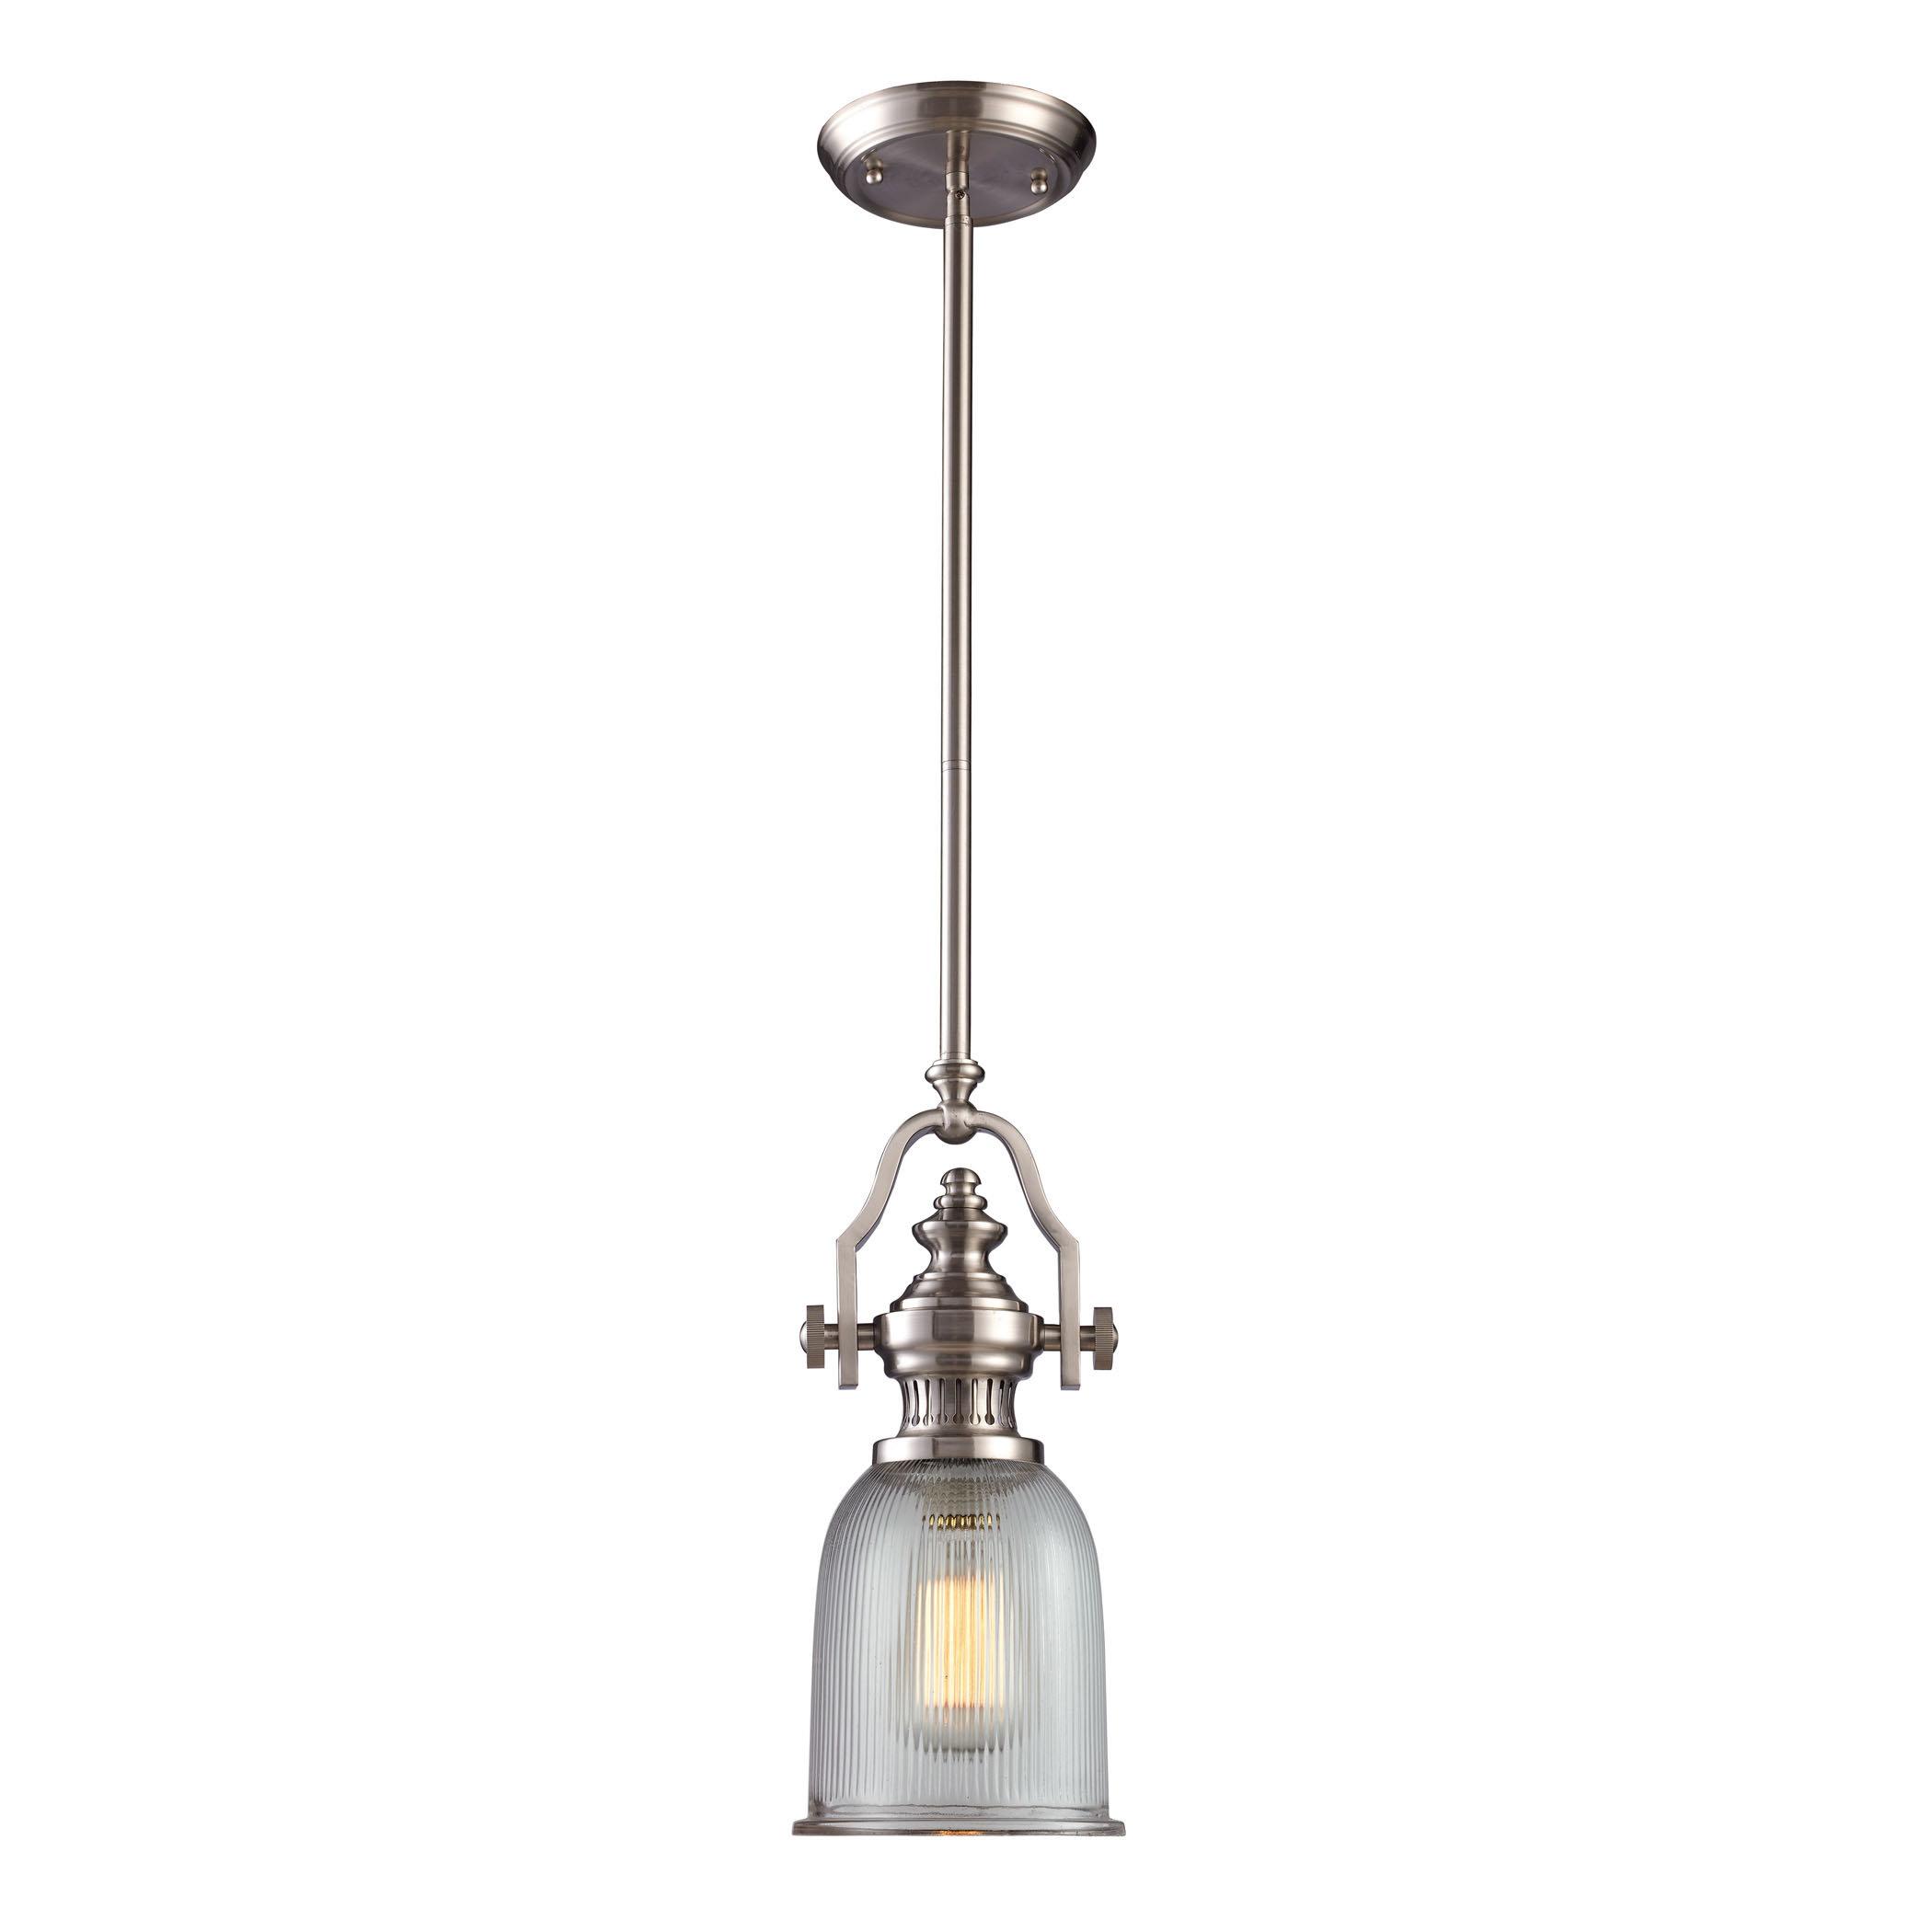 Birch Lane™ Heritage Erico 1 Light Single Bell Pendant With Grullon Scroll 1 Light Single Bell Pendants (View 6 of 30)